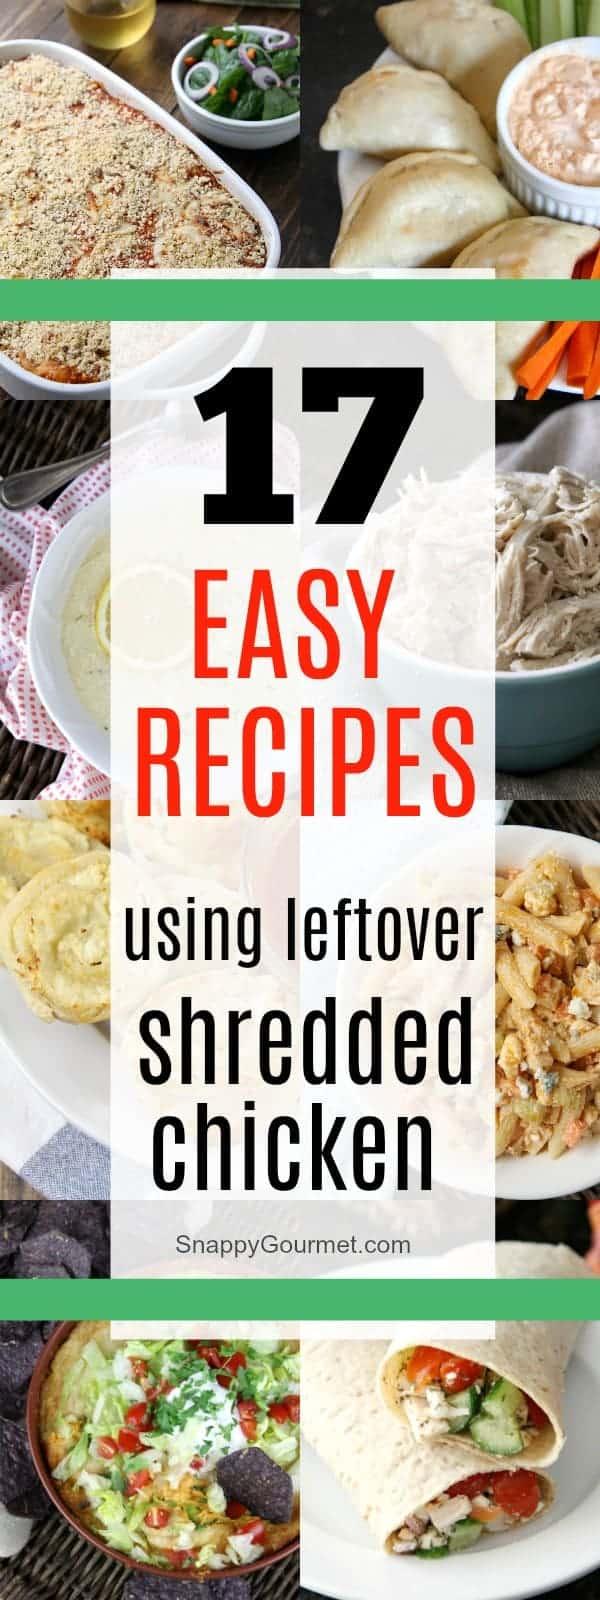 17 easy recipes using leftover chicken! #Chicken #dinner #Recipe #SnappyGourmet #yum #easy #Homemade